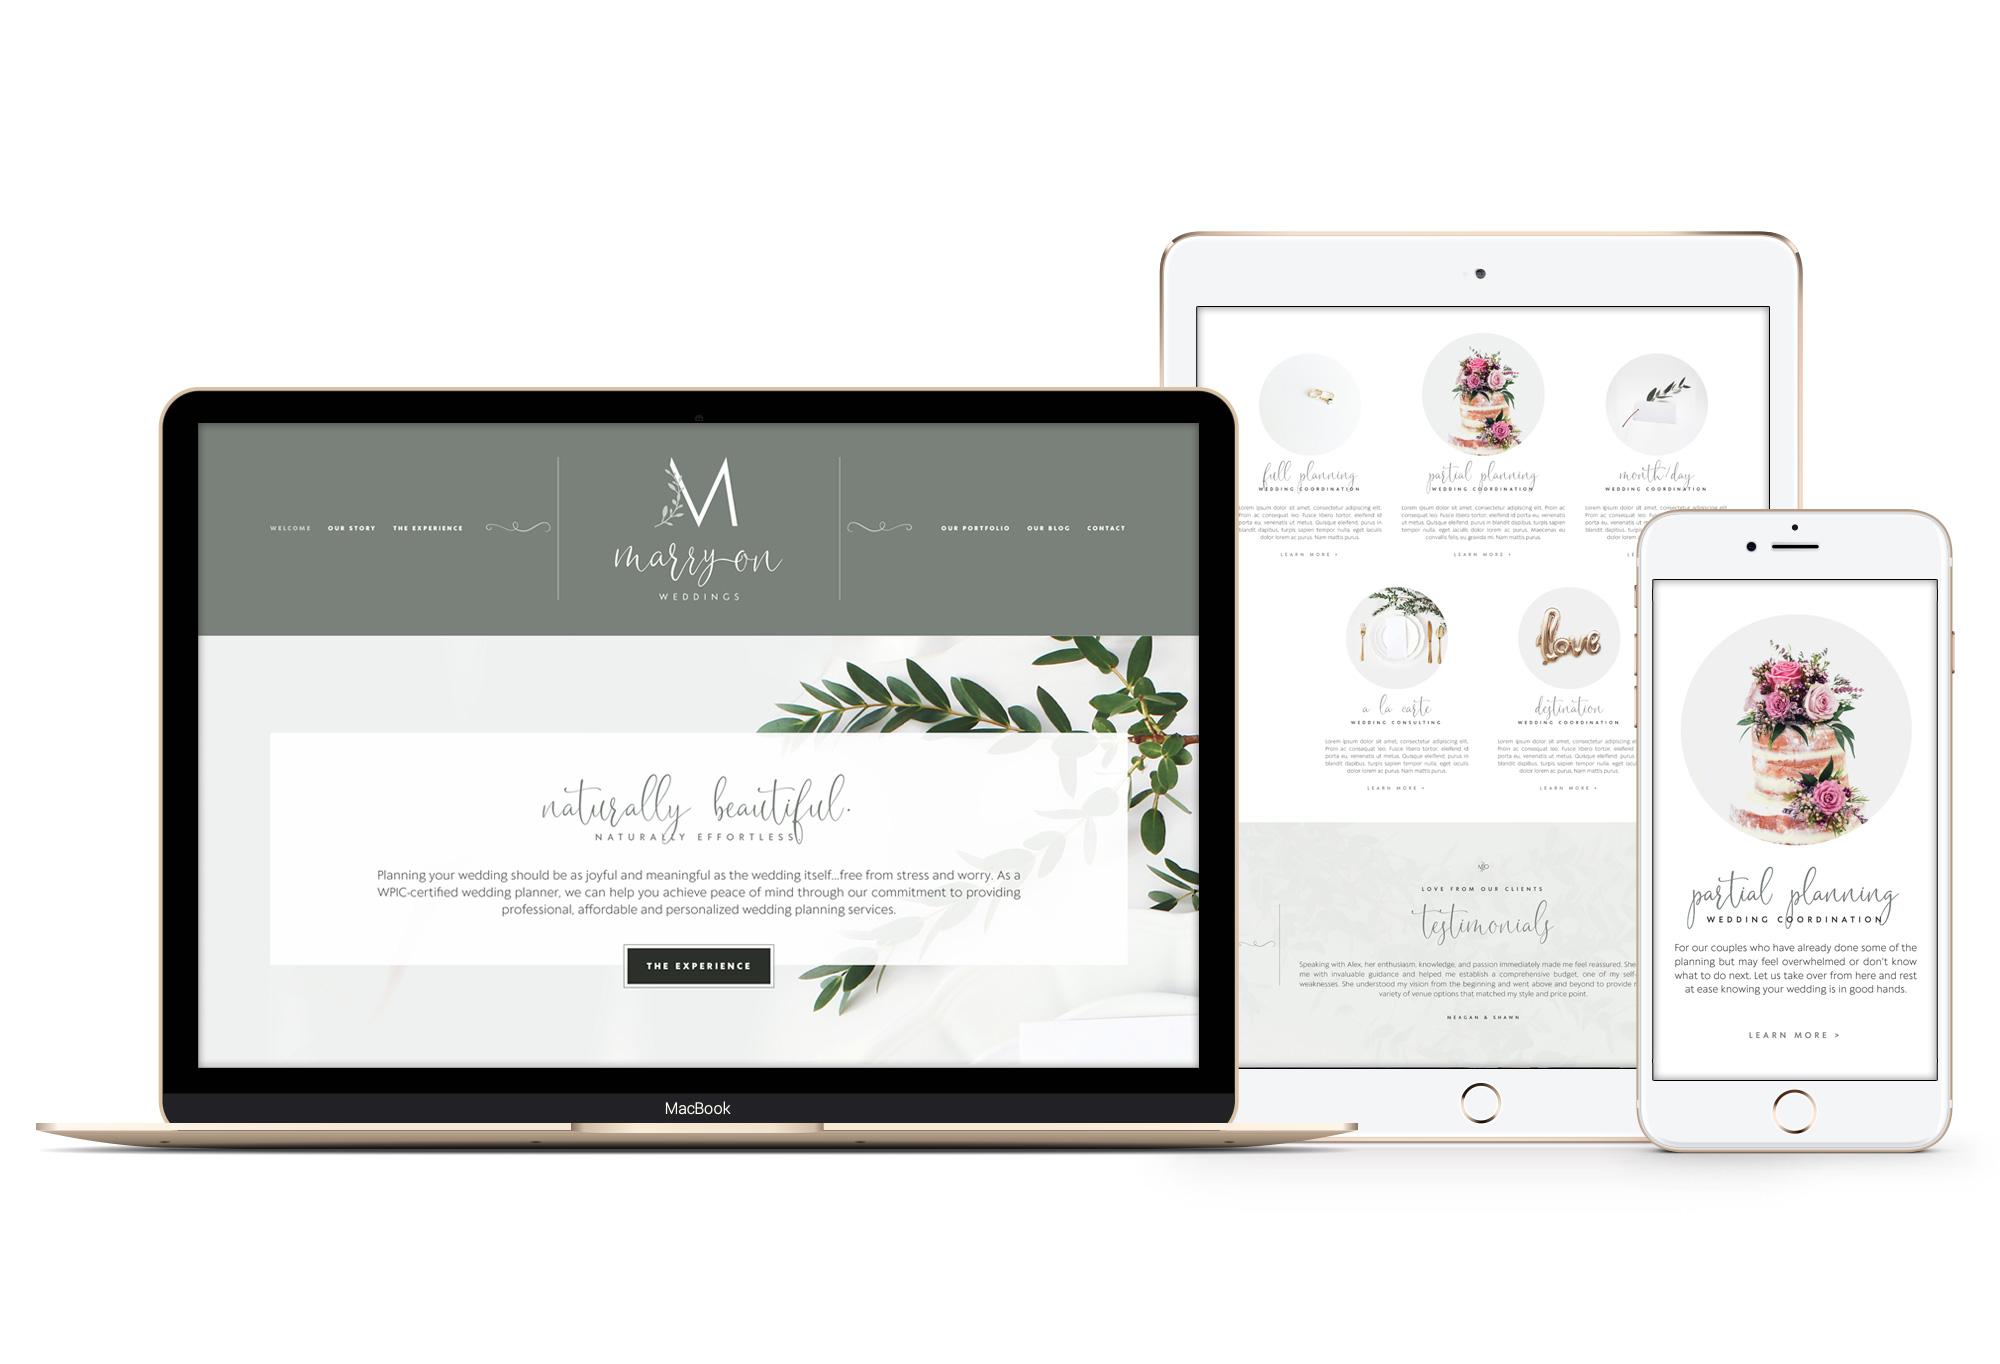 More Than Just a Pretty Website: Website Design + Branding